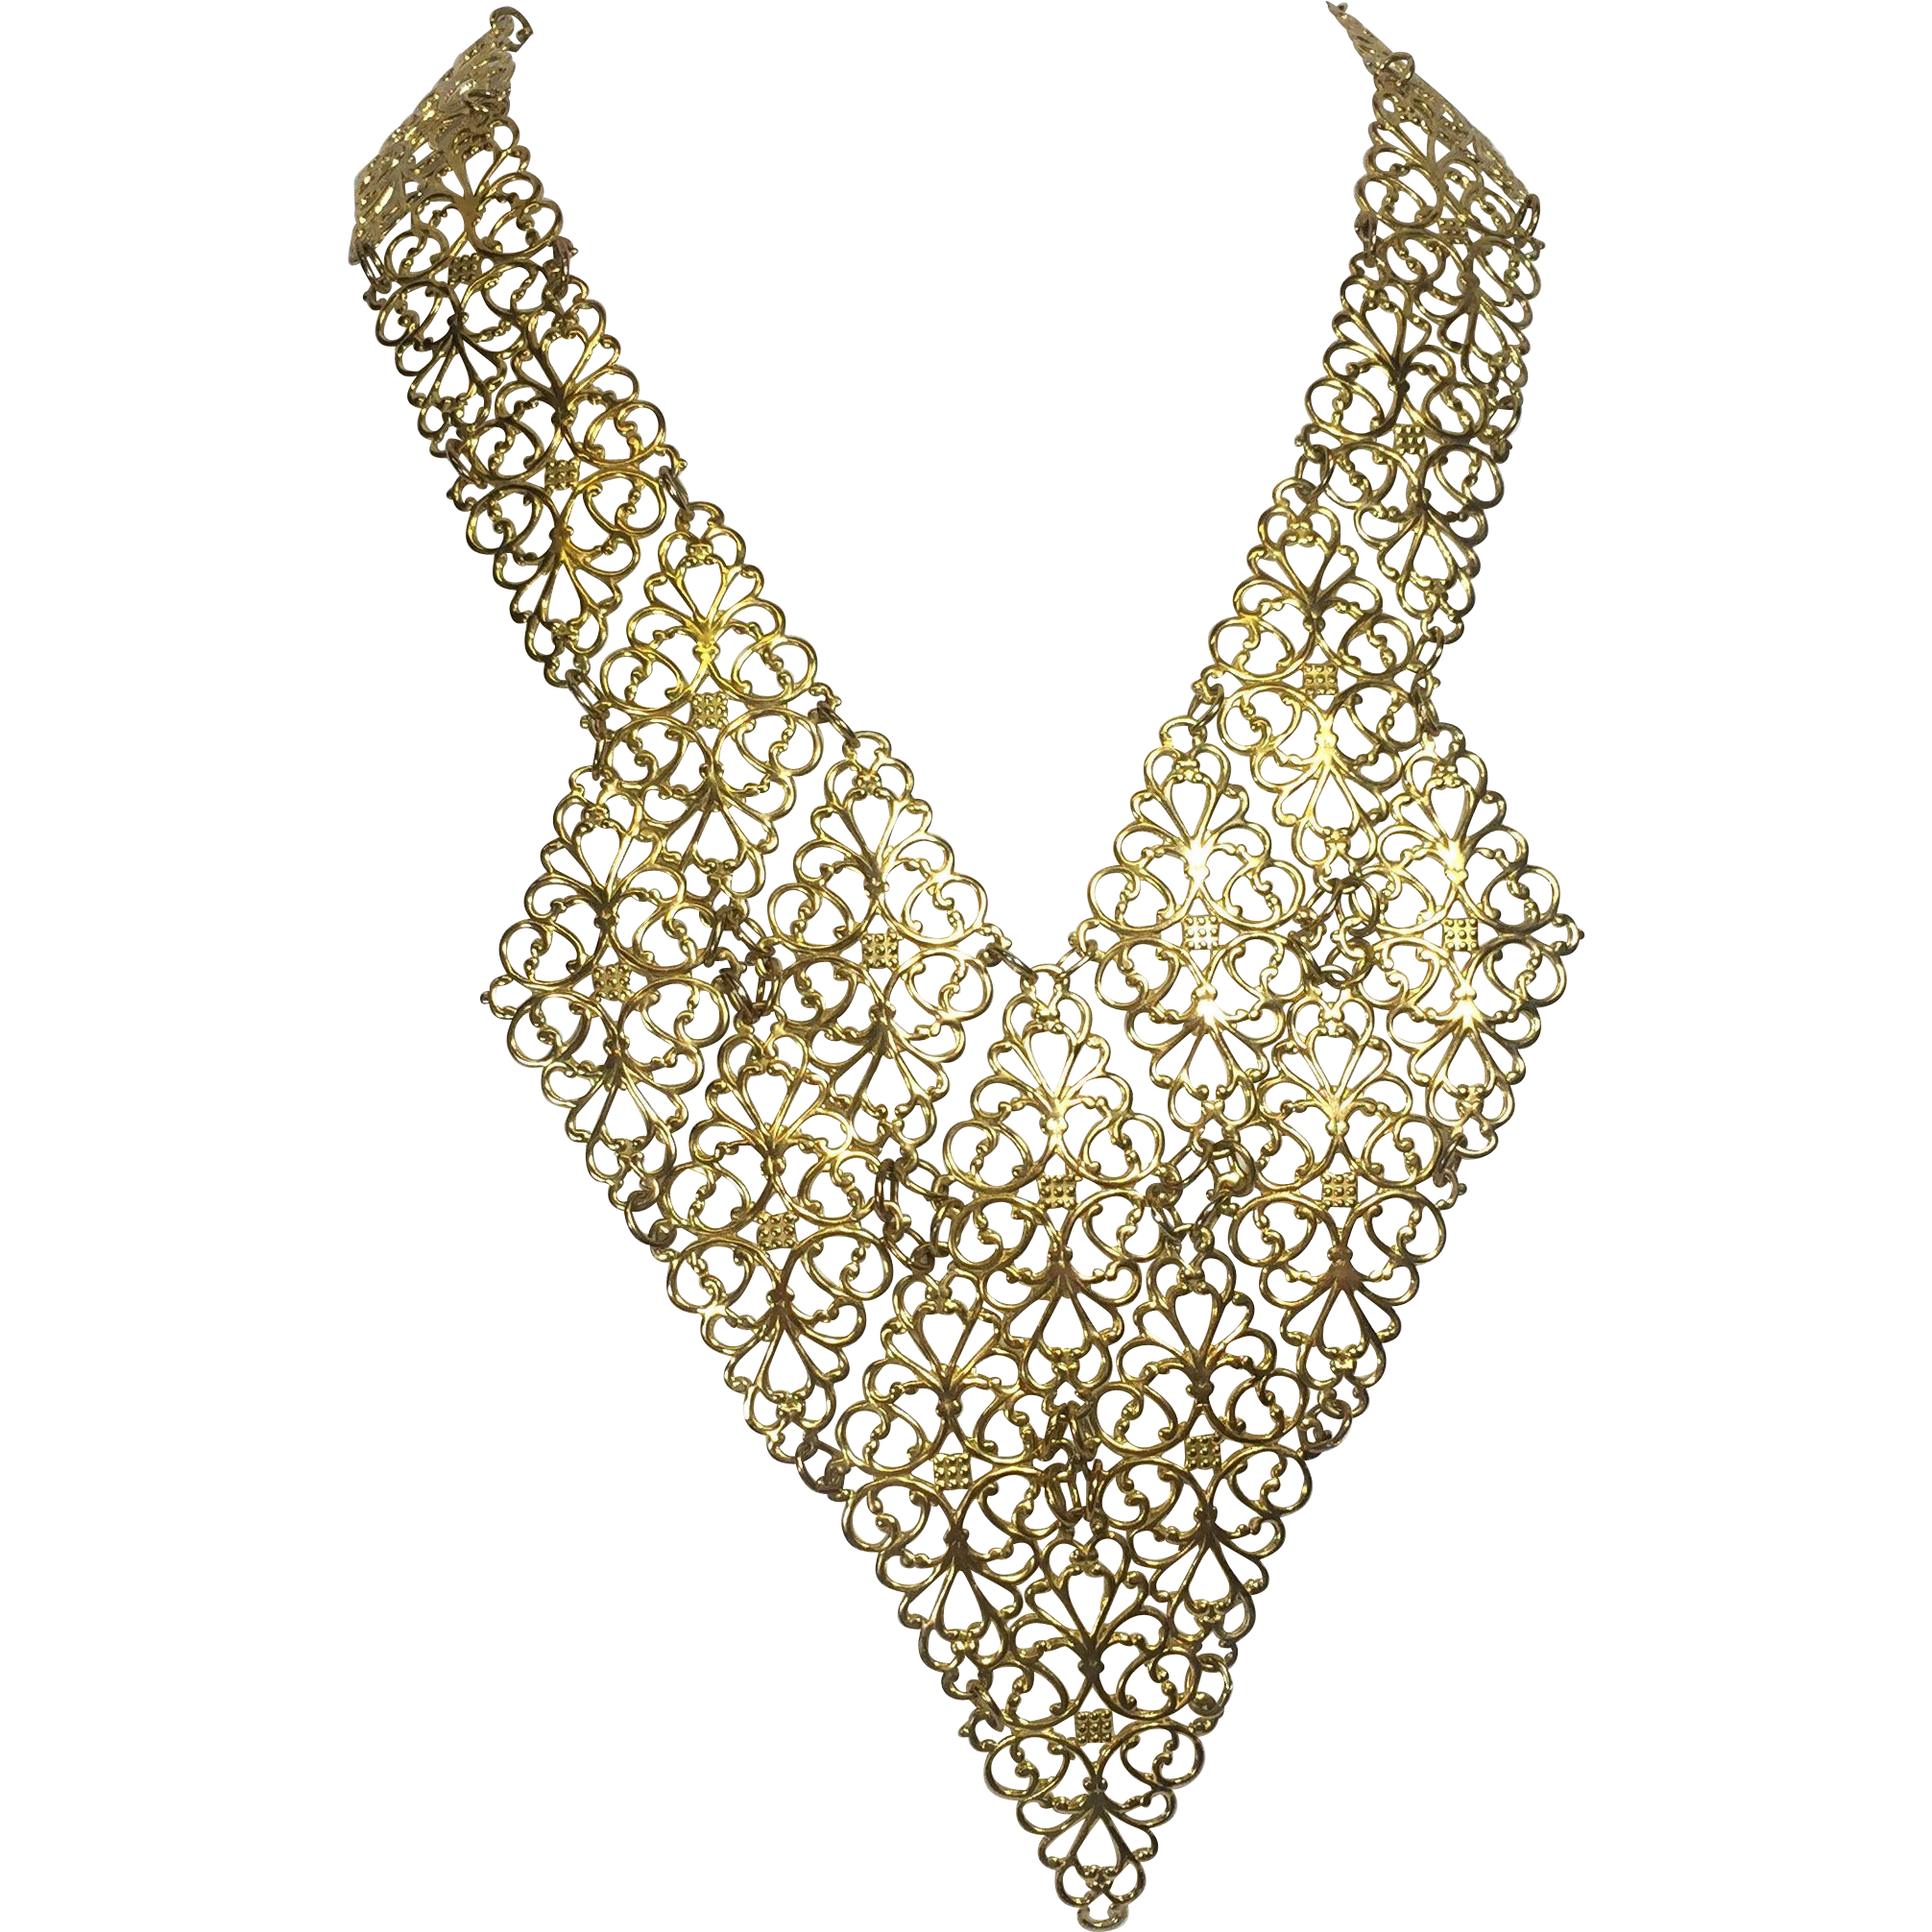 Sleek Golden Filigree Collar / Bib Necklace